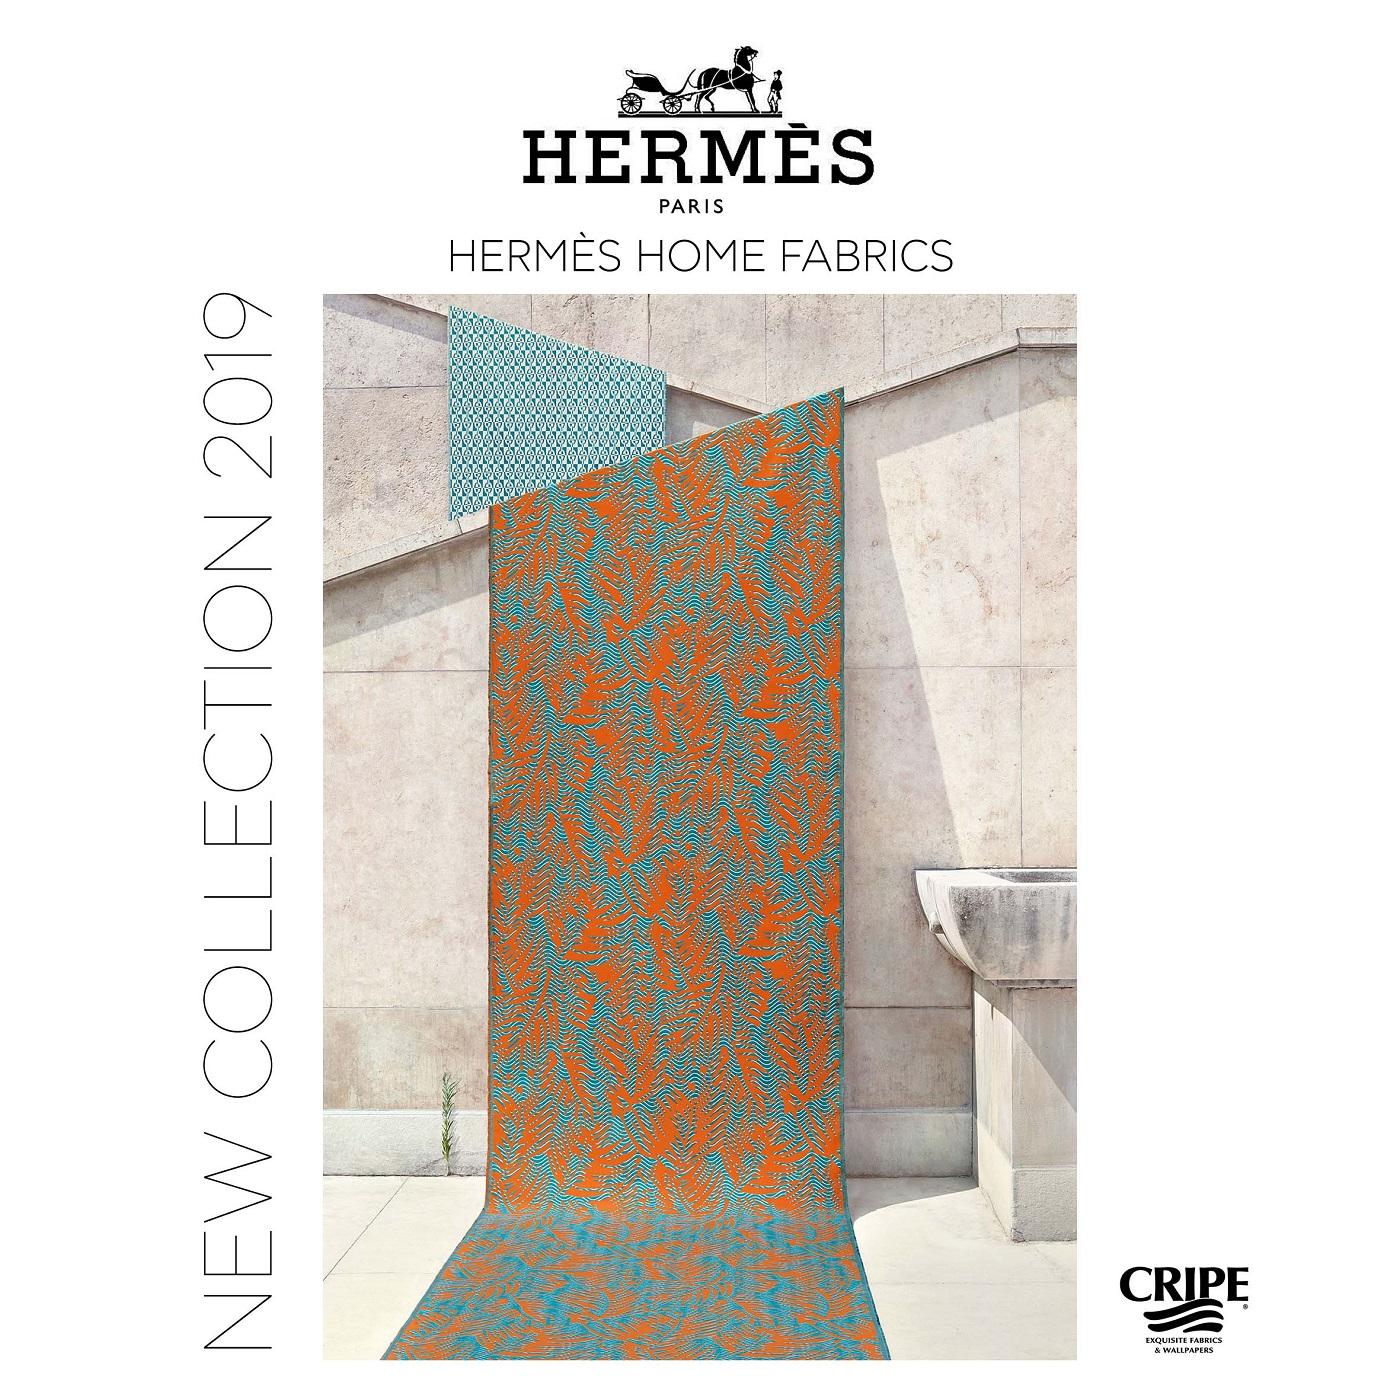 HERMES-2019-CRIPE-PRESENTATION 26